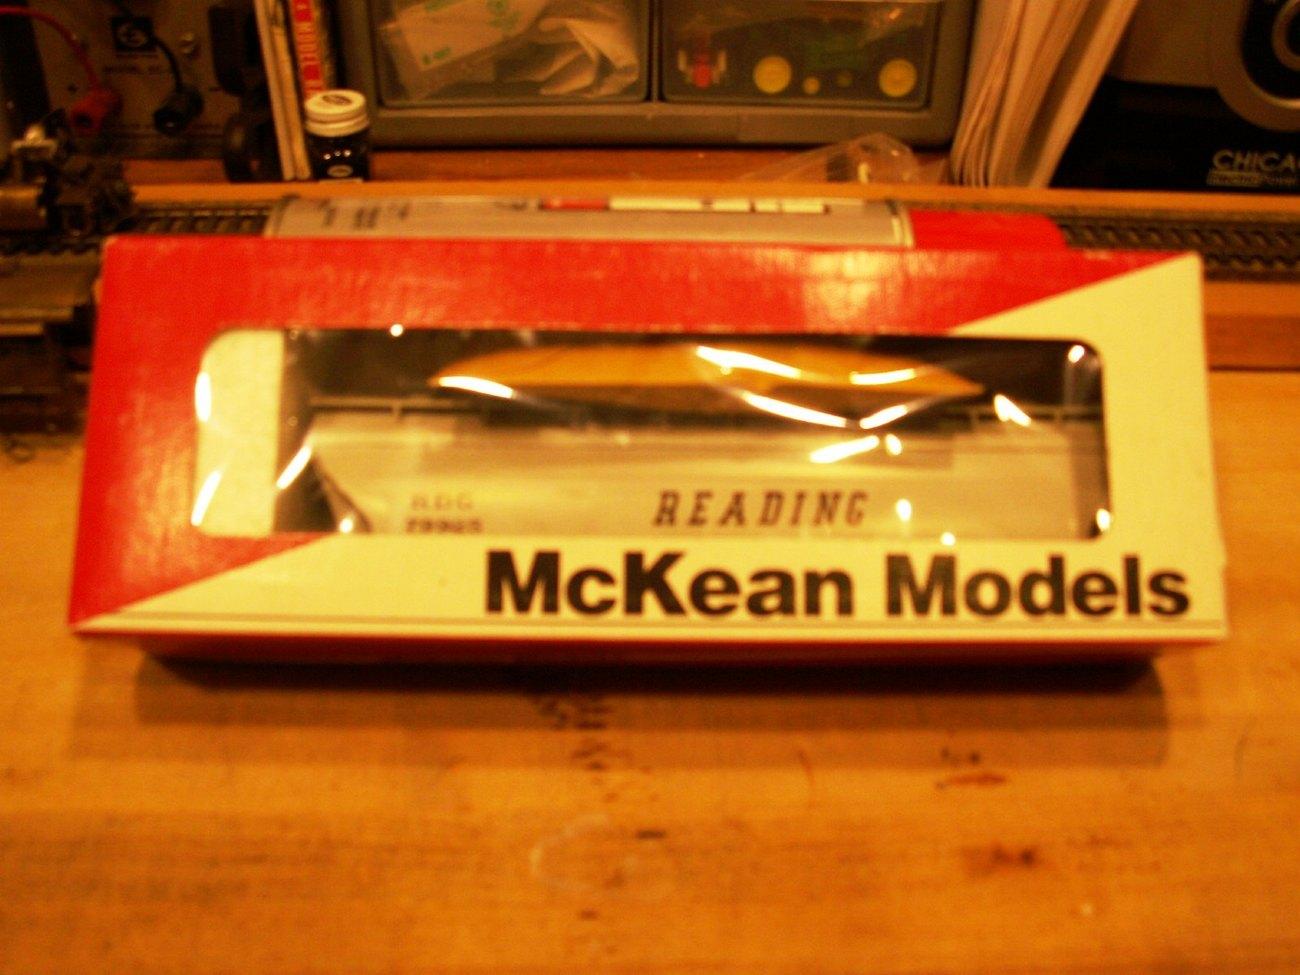 "McKean Models ACF Covered Hopper ""Reading"" Kit - New in Box"